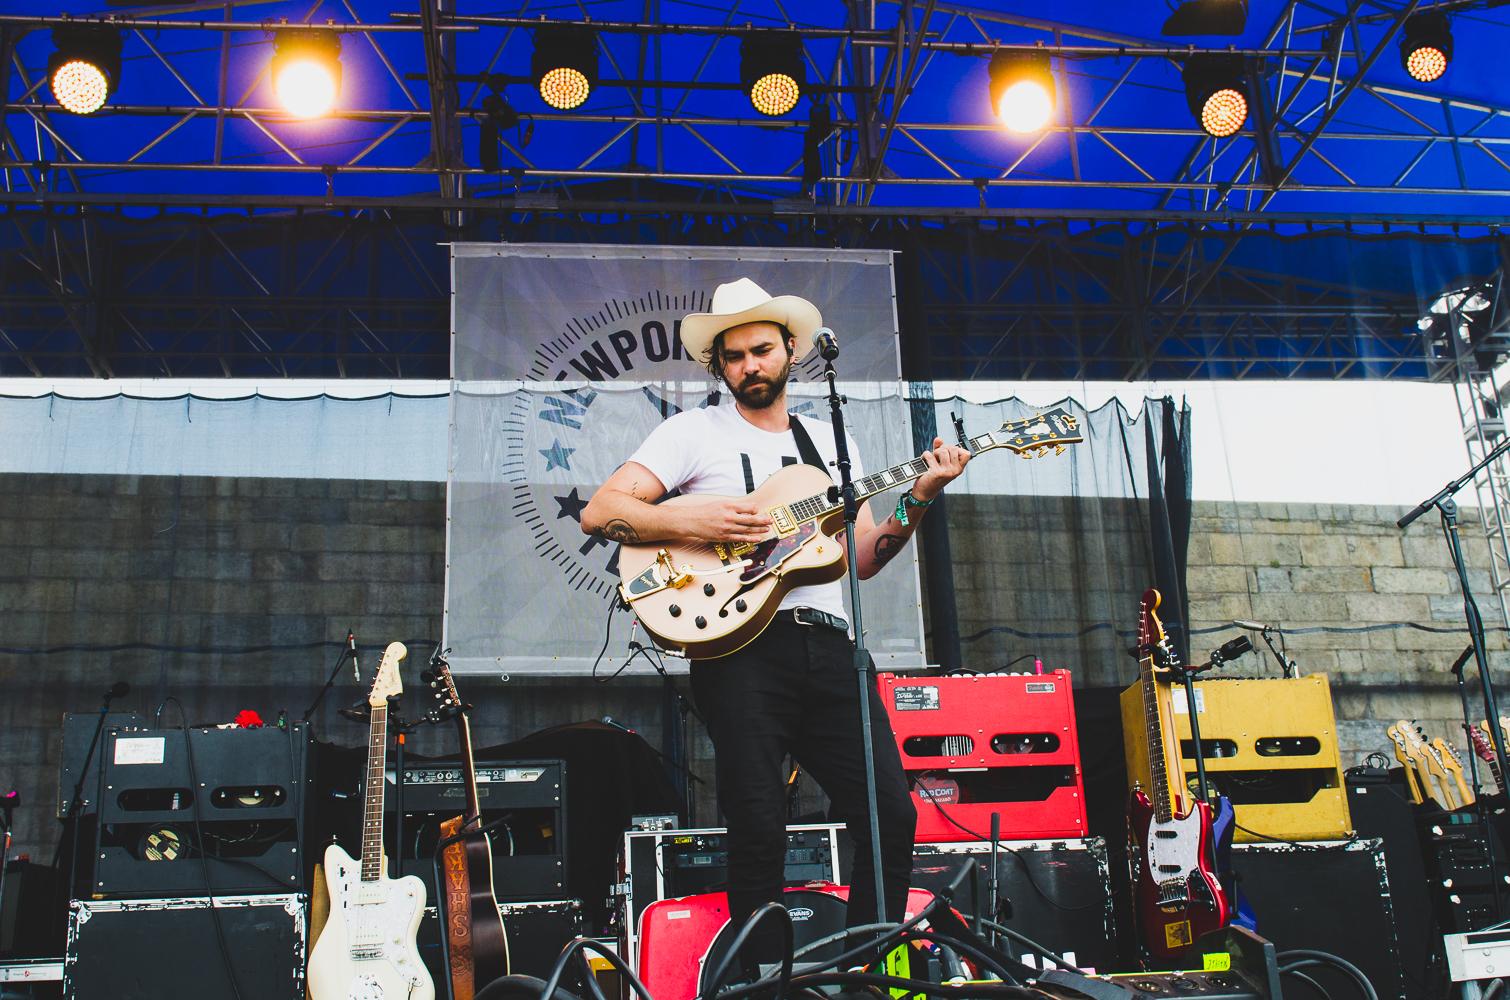 Newport Folk 2018 Ben Kaye-Shakey Graves 1